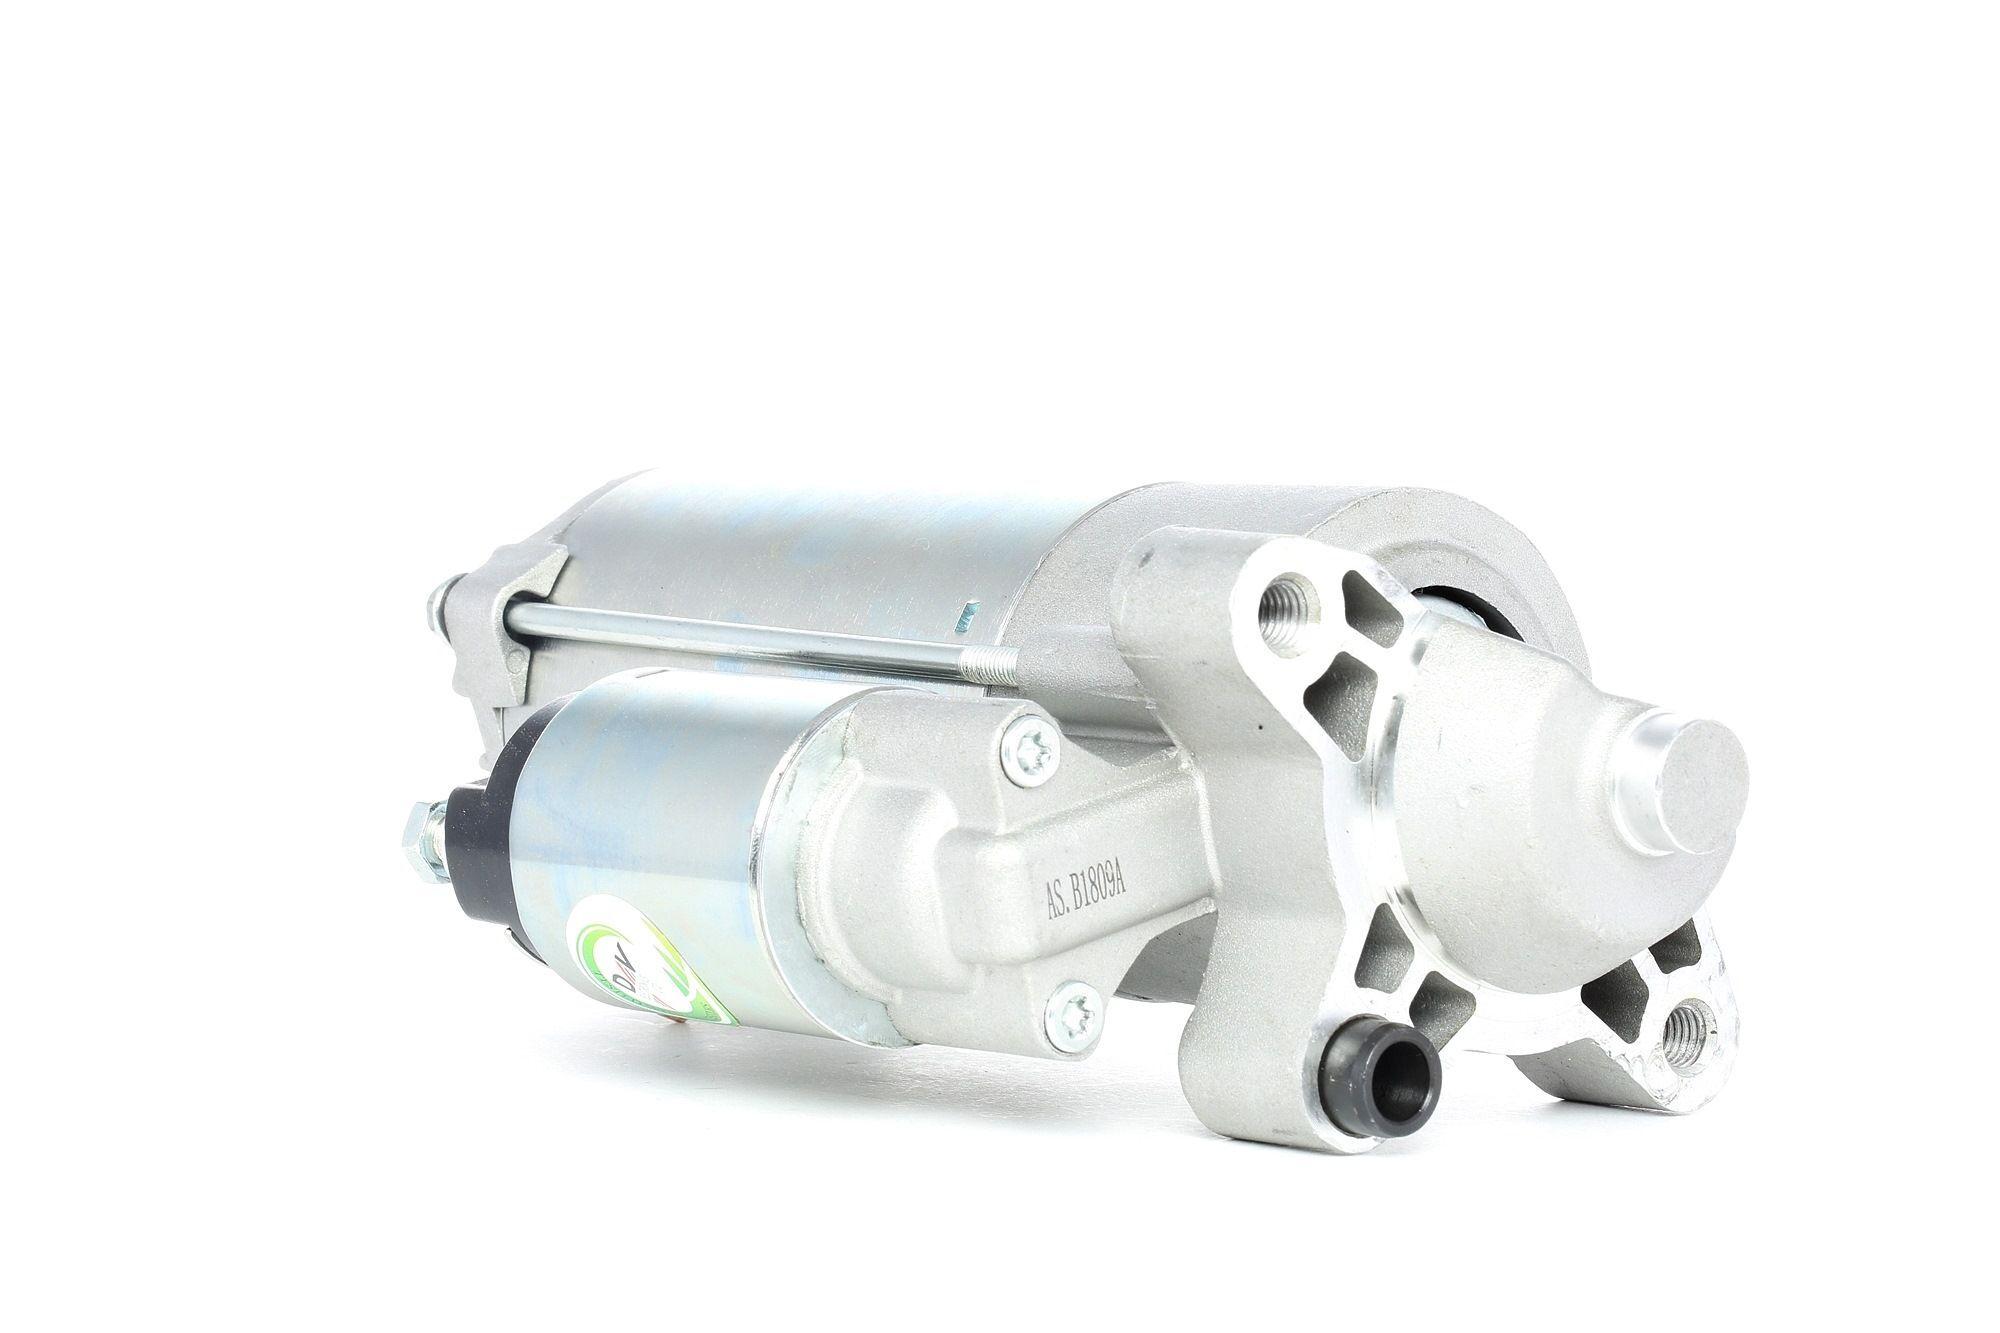 AS-PL Starttimoottori Brand new AS-PL Alternator D.E. bracket S9033 Startti,Käynnistinmoottori FORD,VOLVO,FOCUS II Kombi DA_,MONDEO IV Turnier BA7